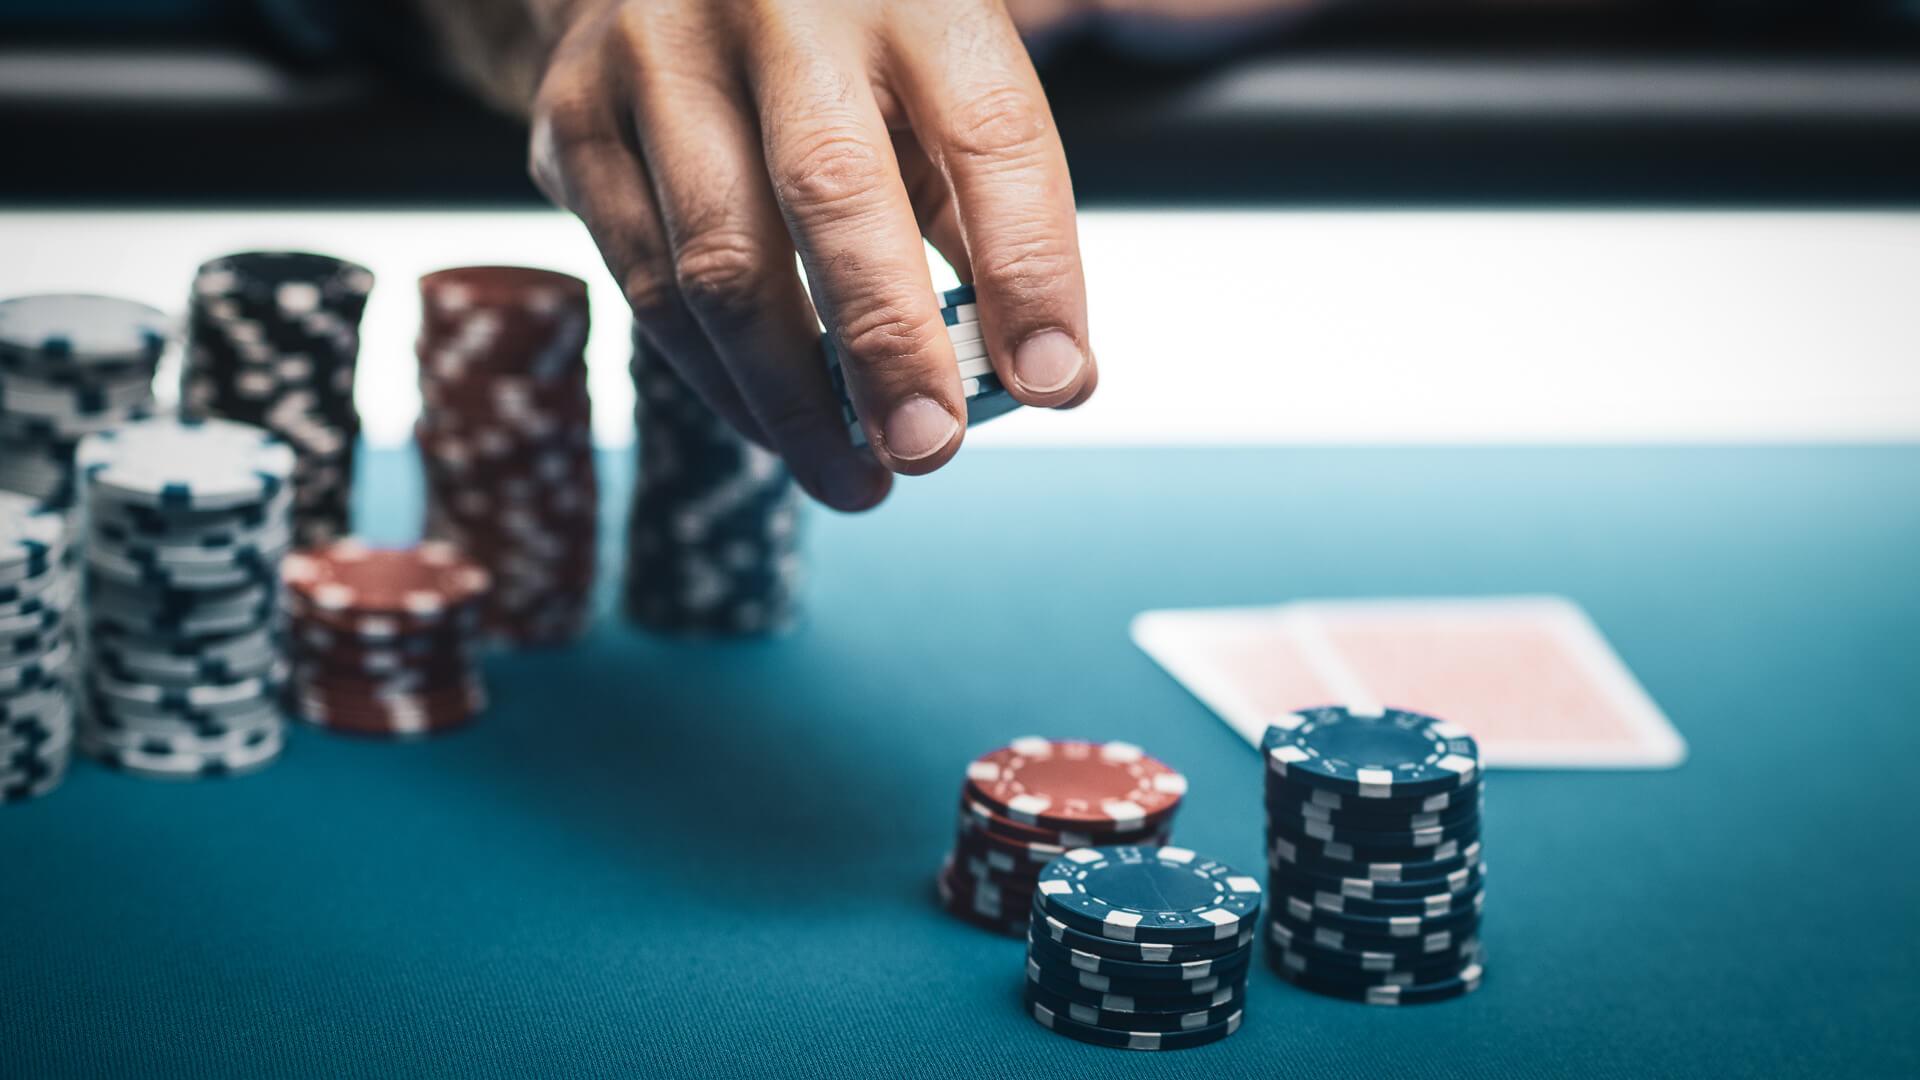 secrets that casinos